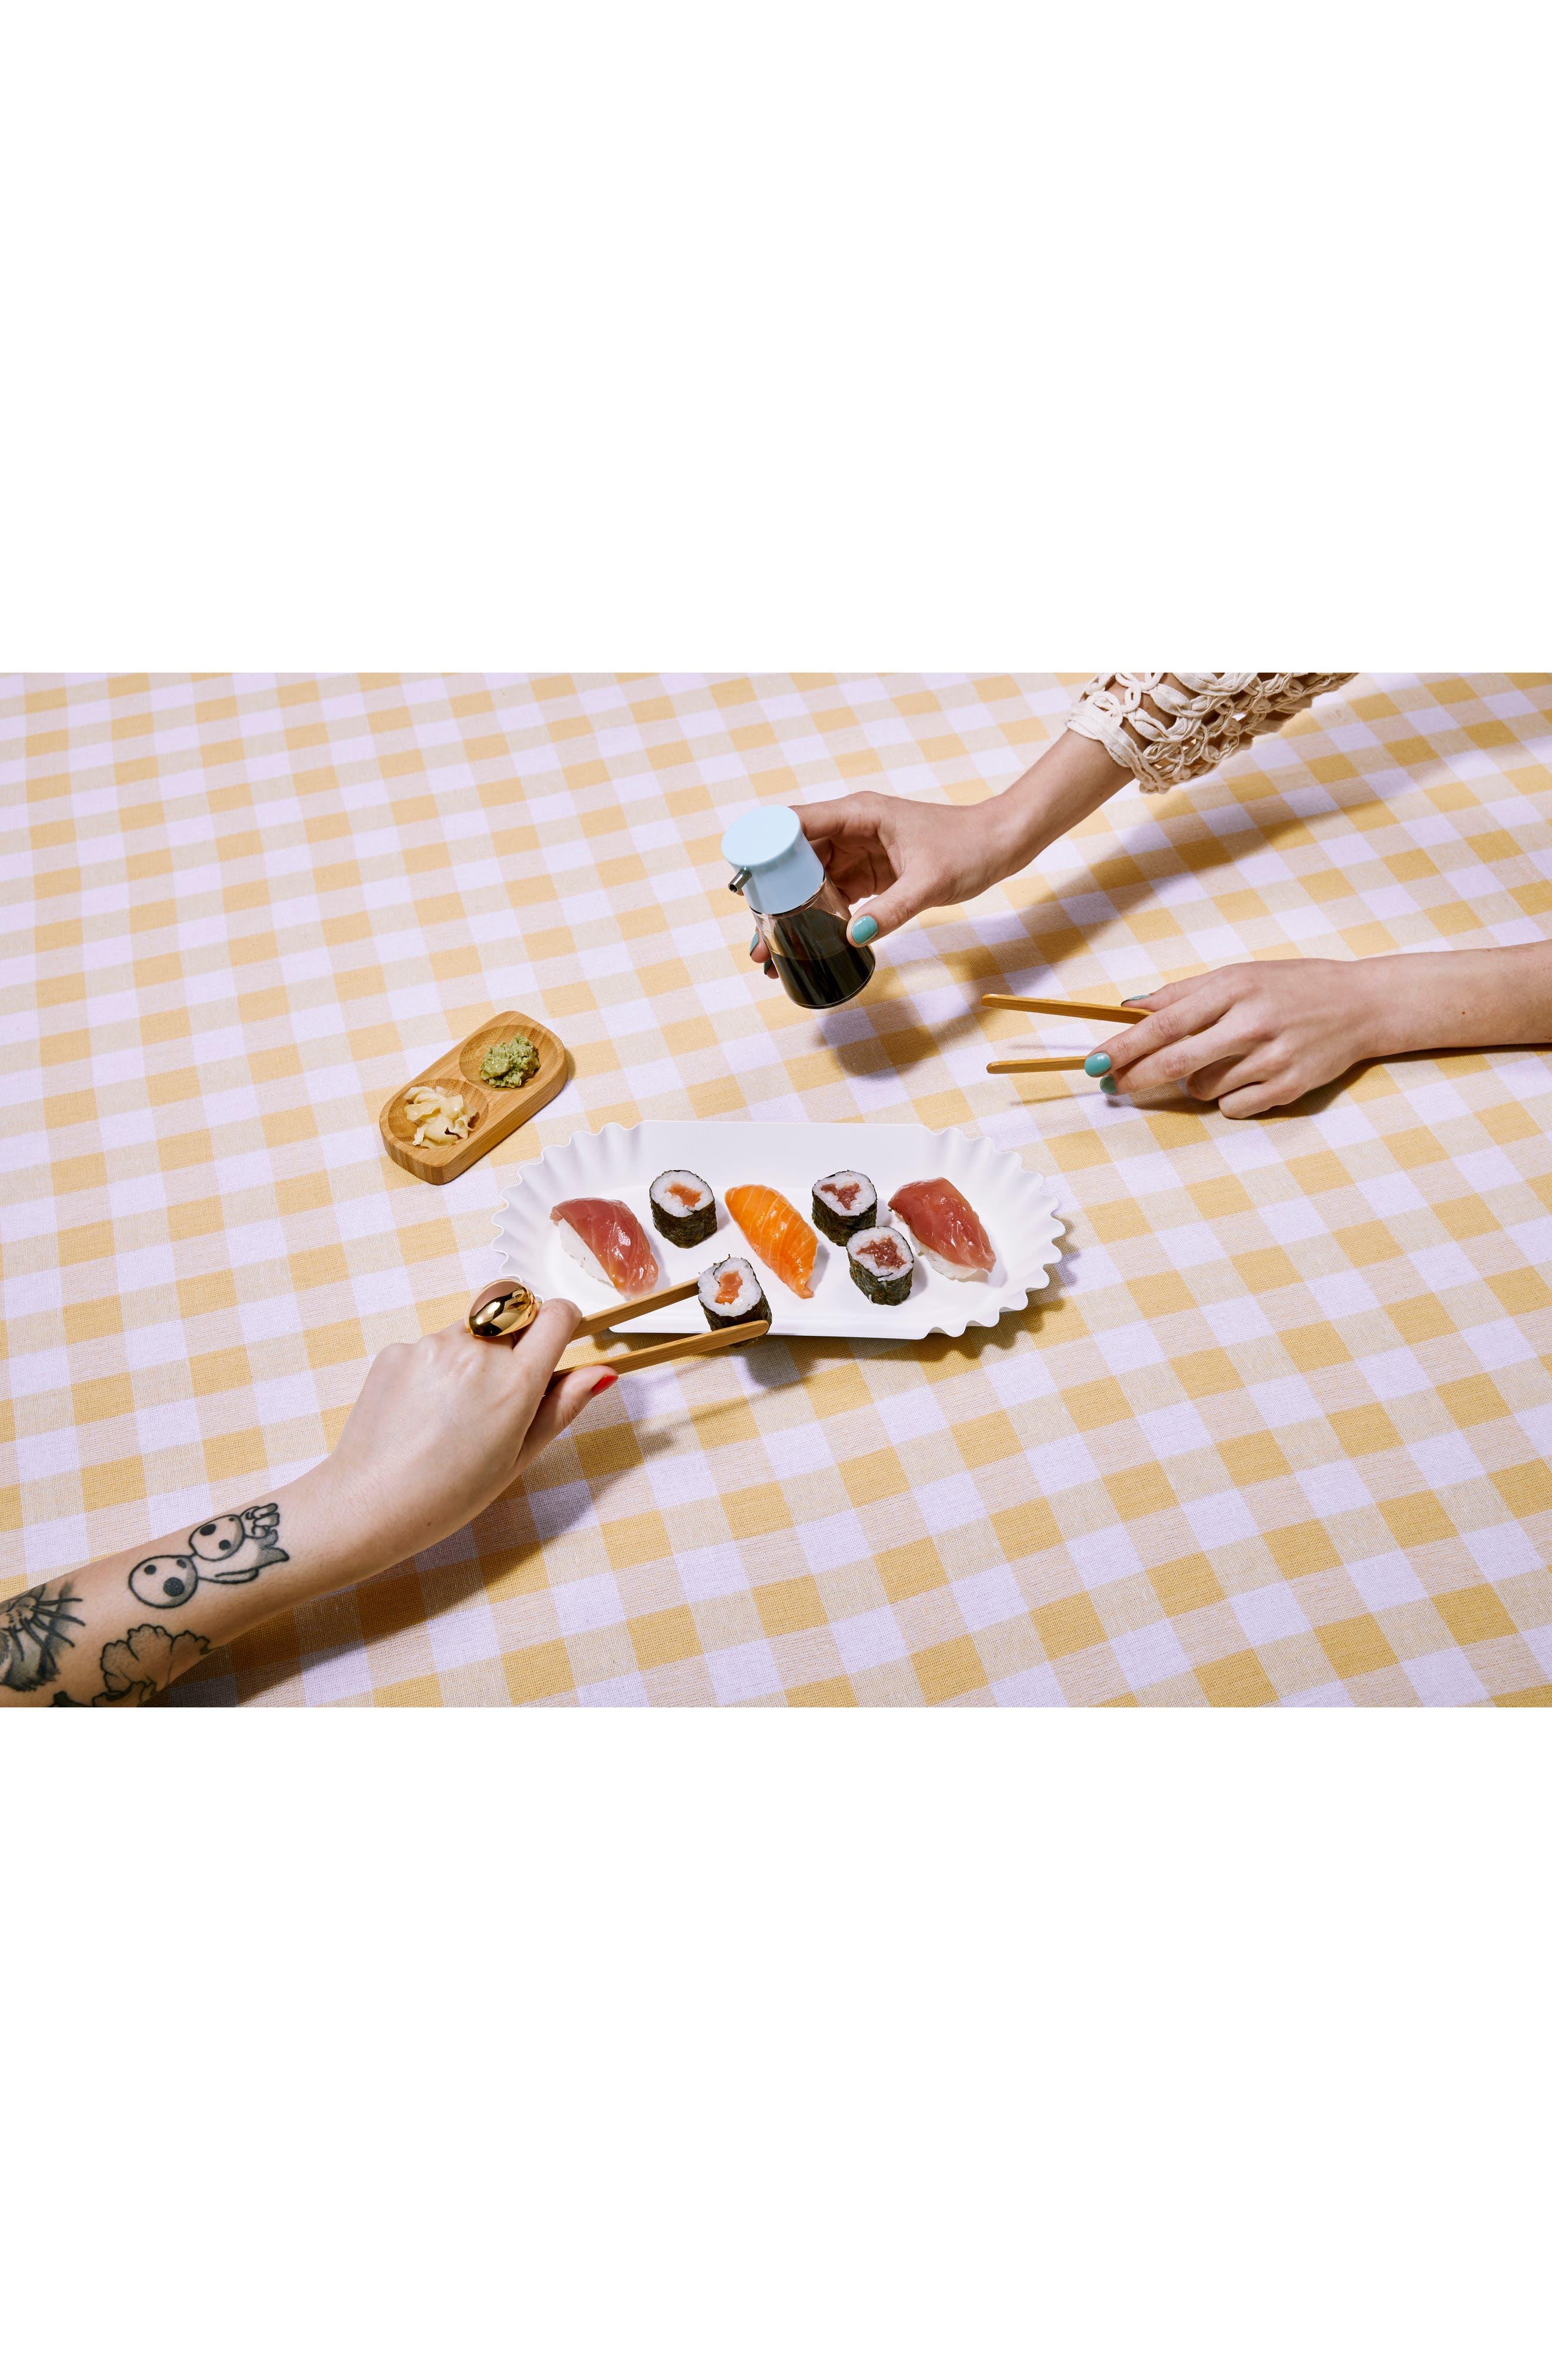 3-Piece Bamboo Sushi Tray & Songs Set,                             Alternate thumbnail 2, color,                             Natural